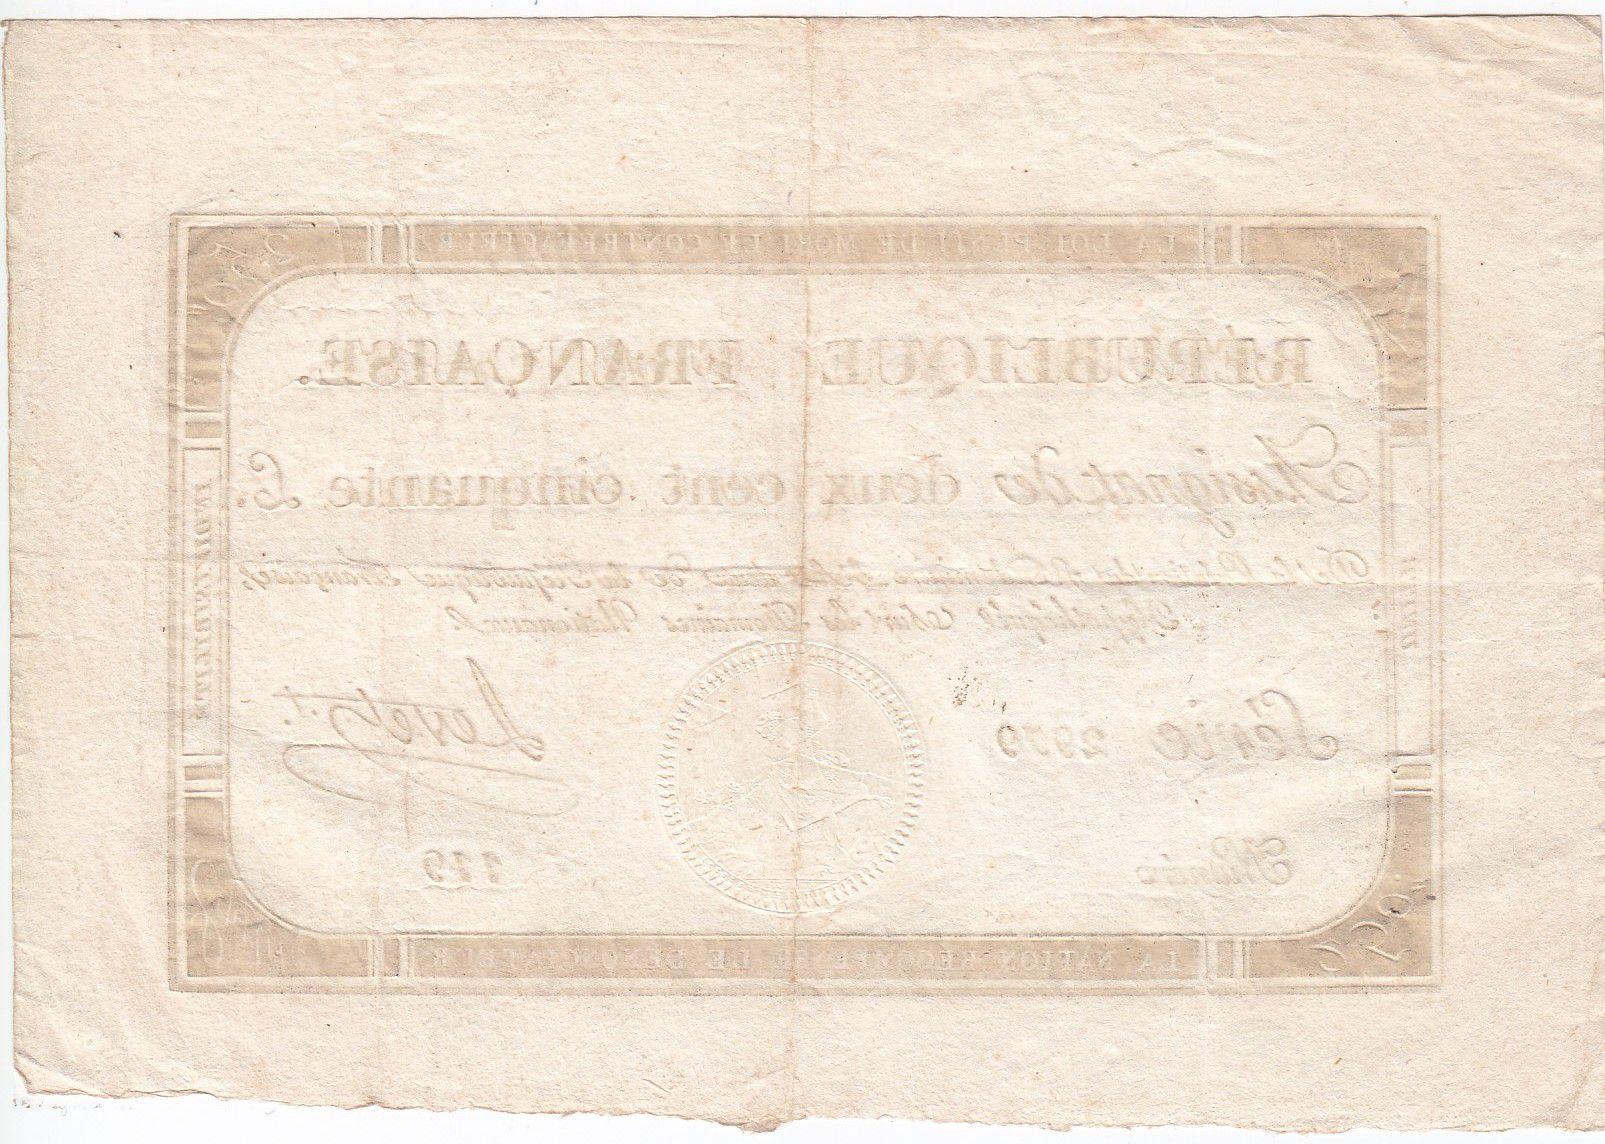 France 250 Livres 7 Vendemiaire An II - 28.9.1793 - Sign.  Levet - VF+